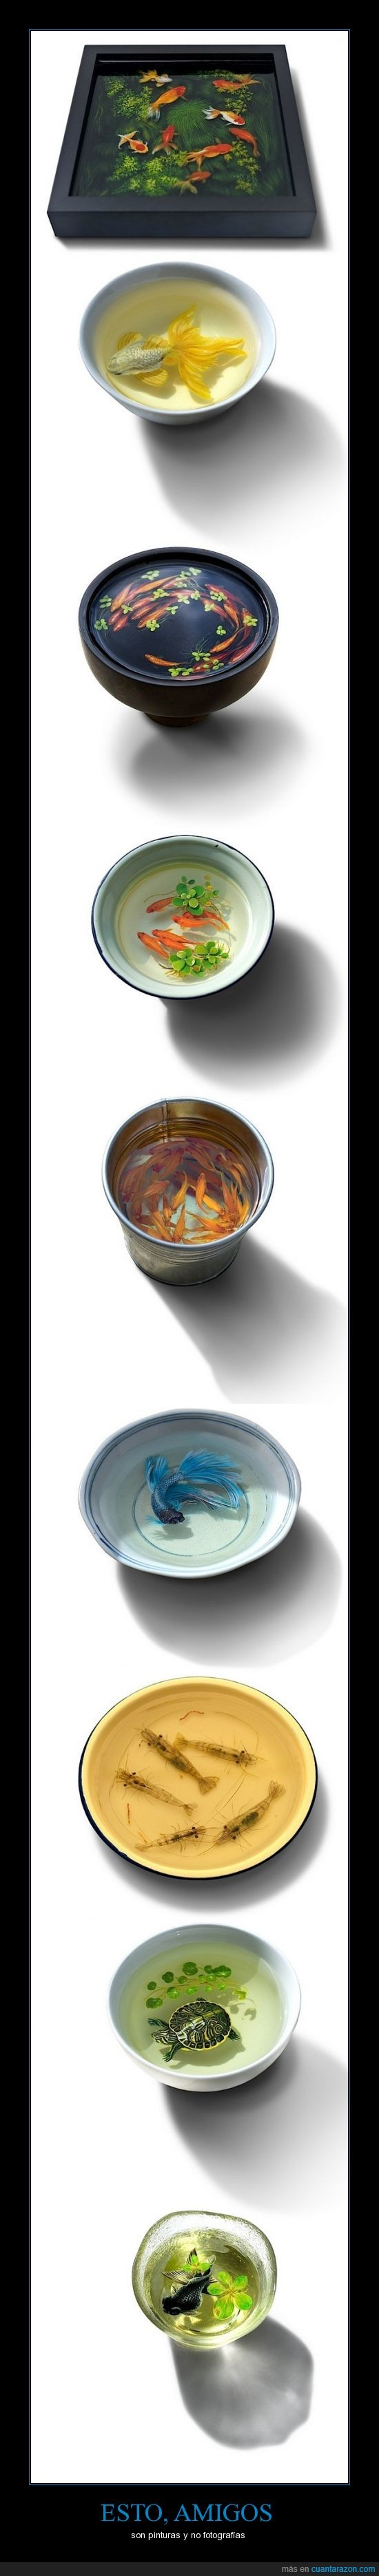 3D,fotografia,hiperrealismo,ken lye,peces,pinturas